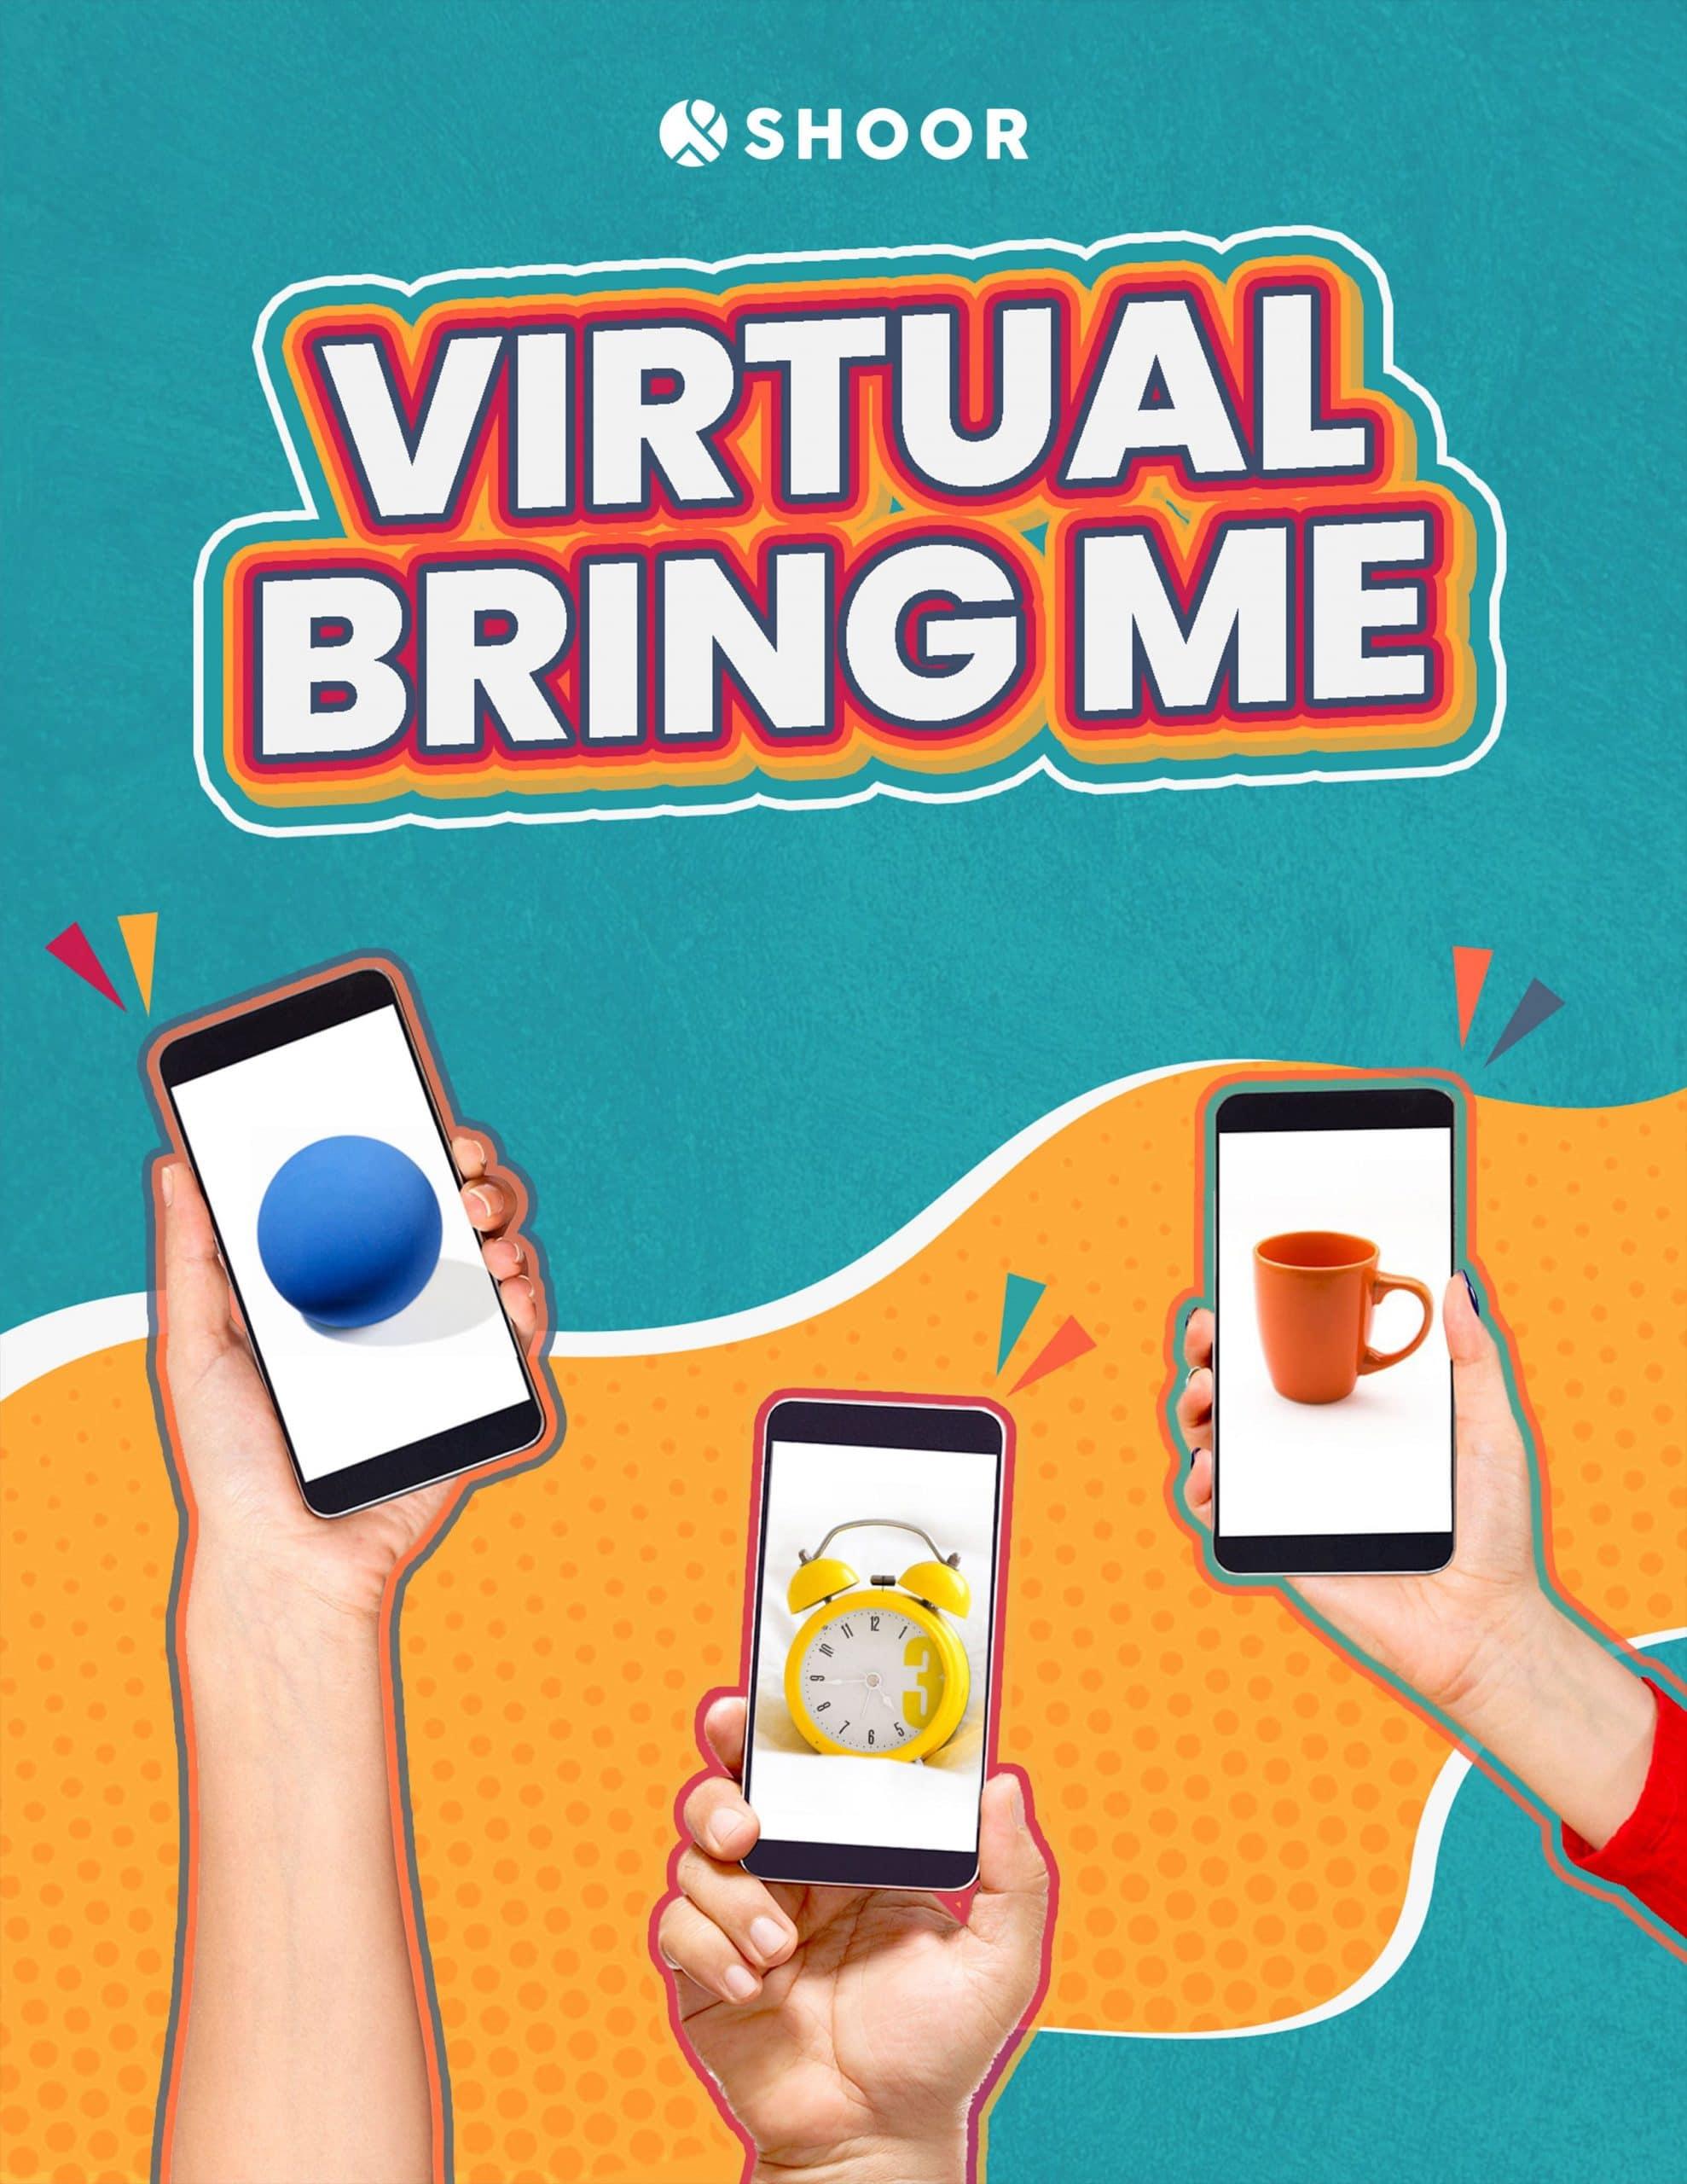 Virtual Bring Me - an online team building activity